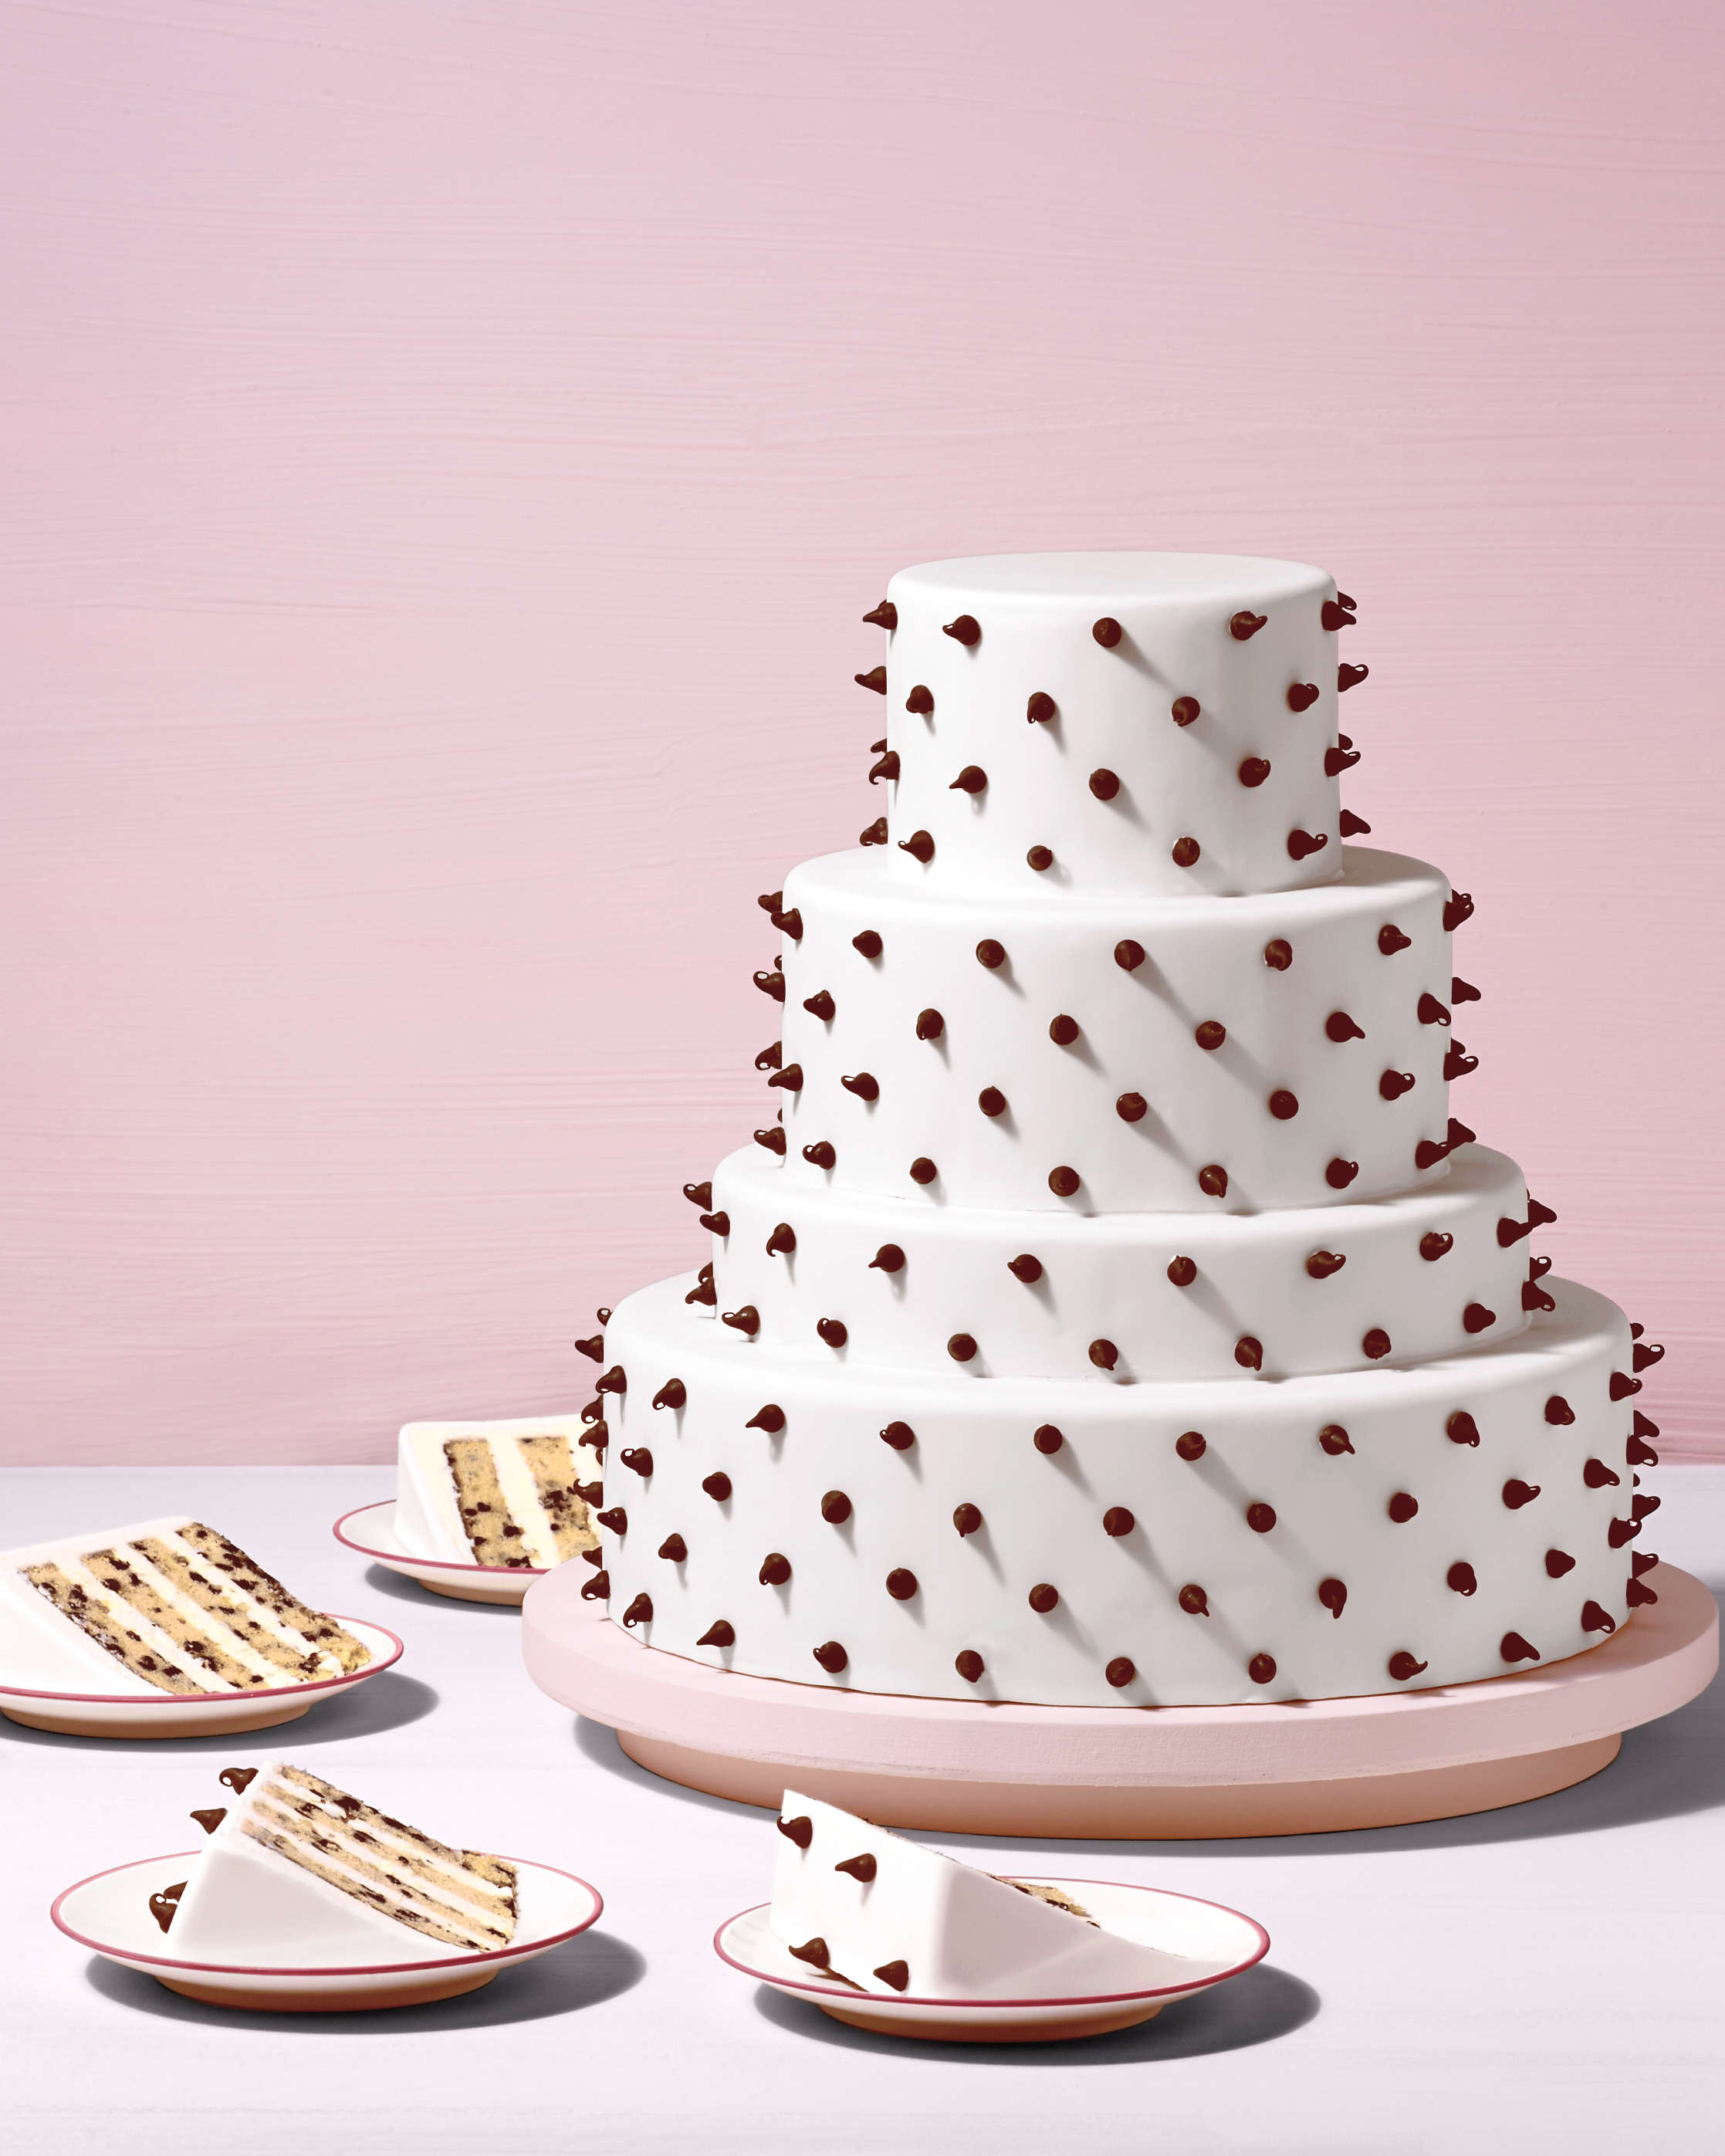 chocolate-chip-cake-d111409.jpg